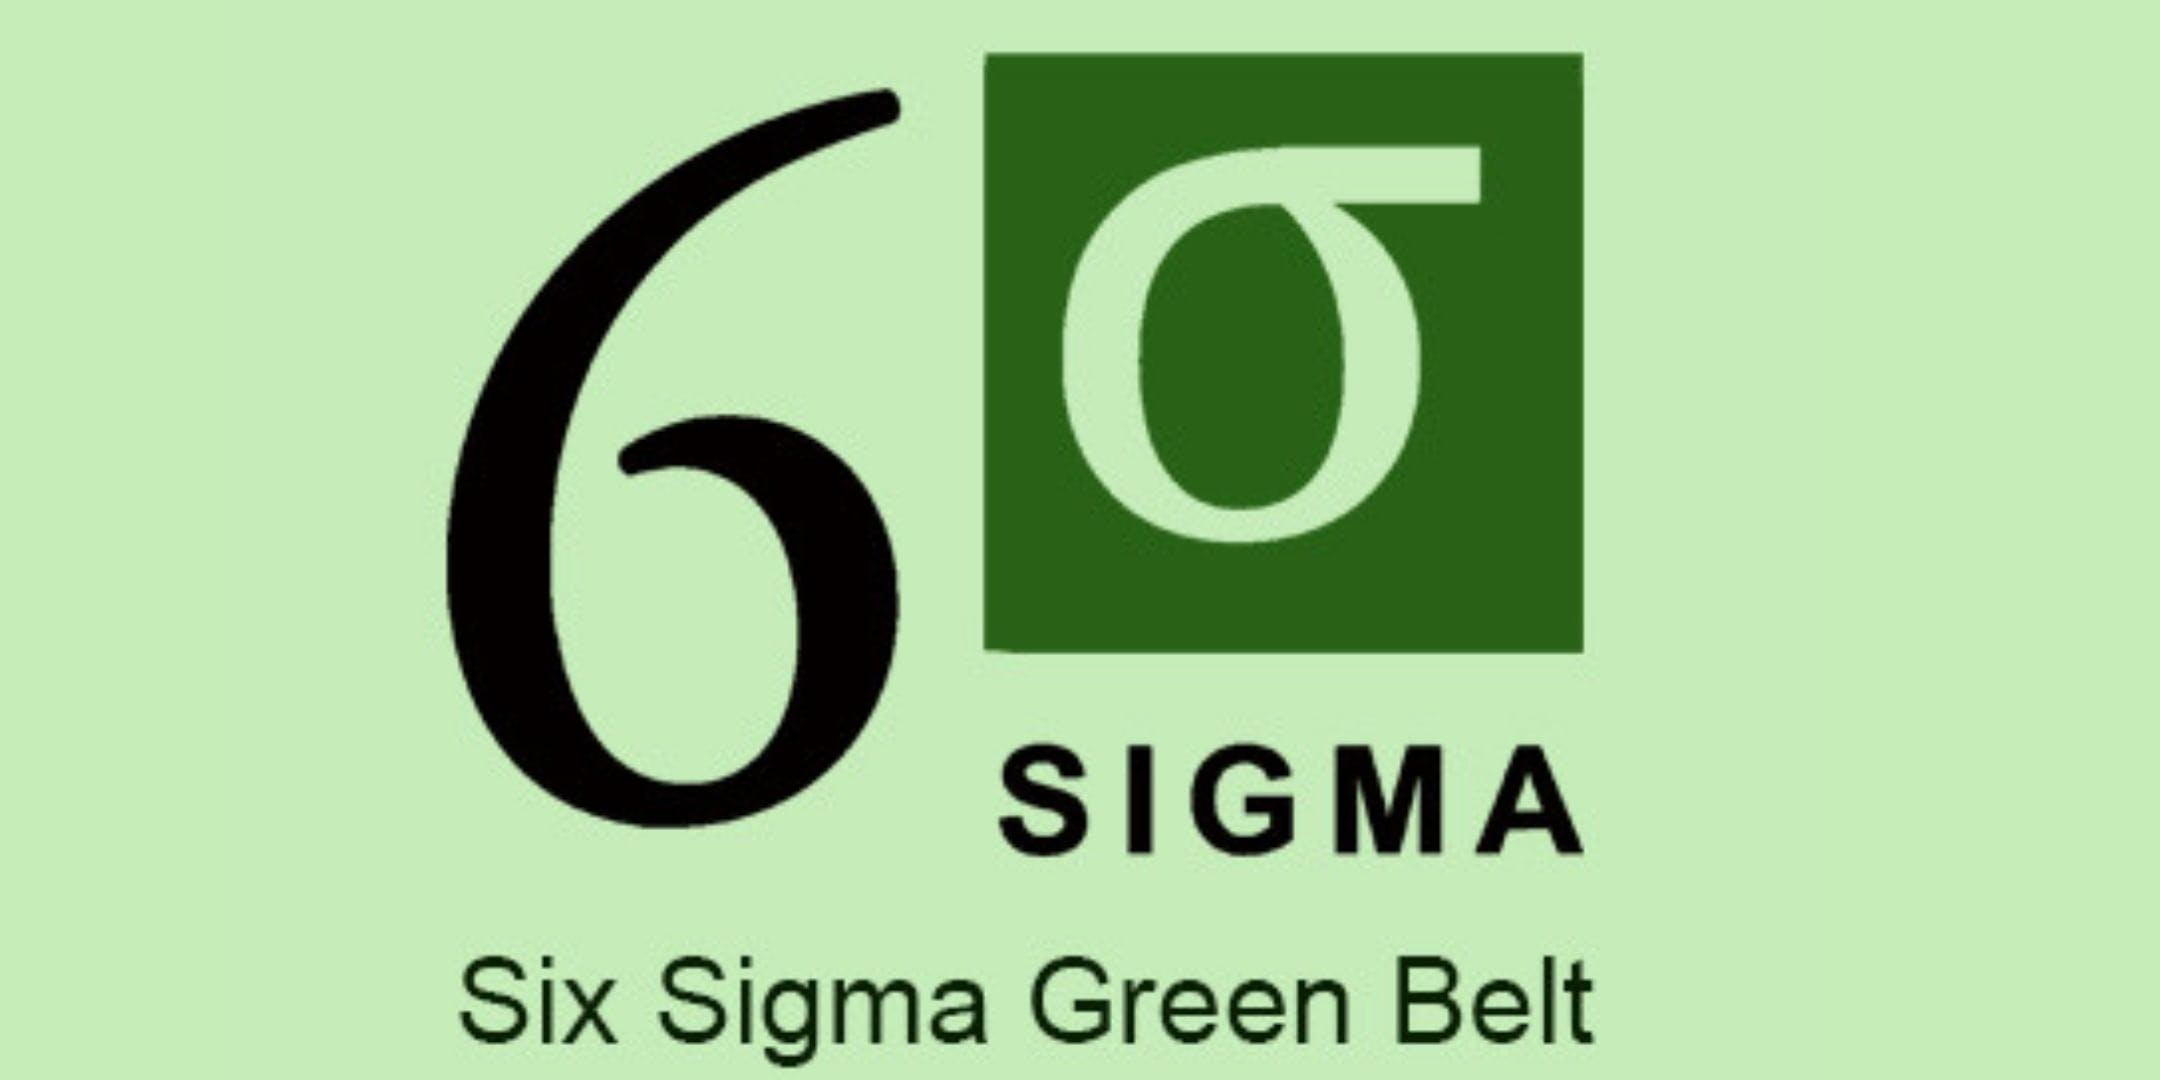 Lean Six Sigma Green Belt (LSSGB) Certification Training in Phoenix, AZ